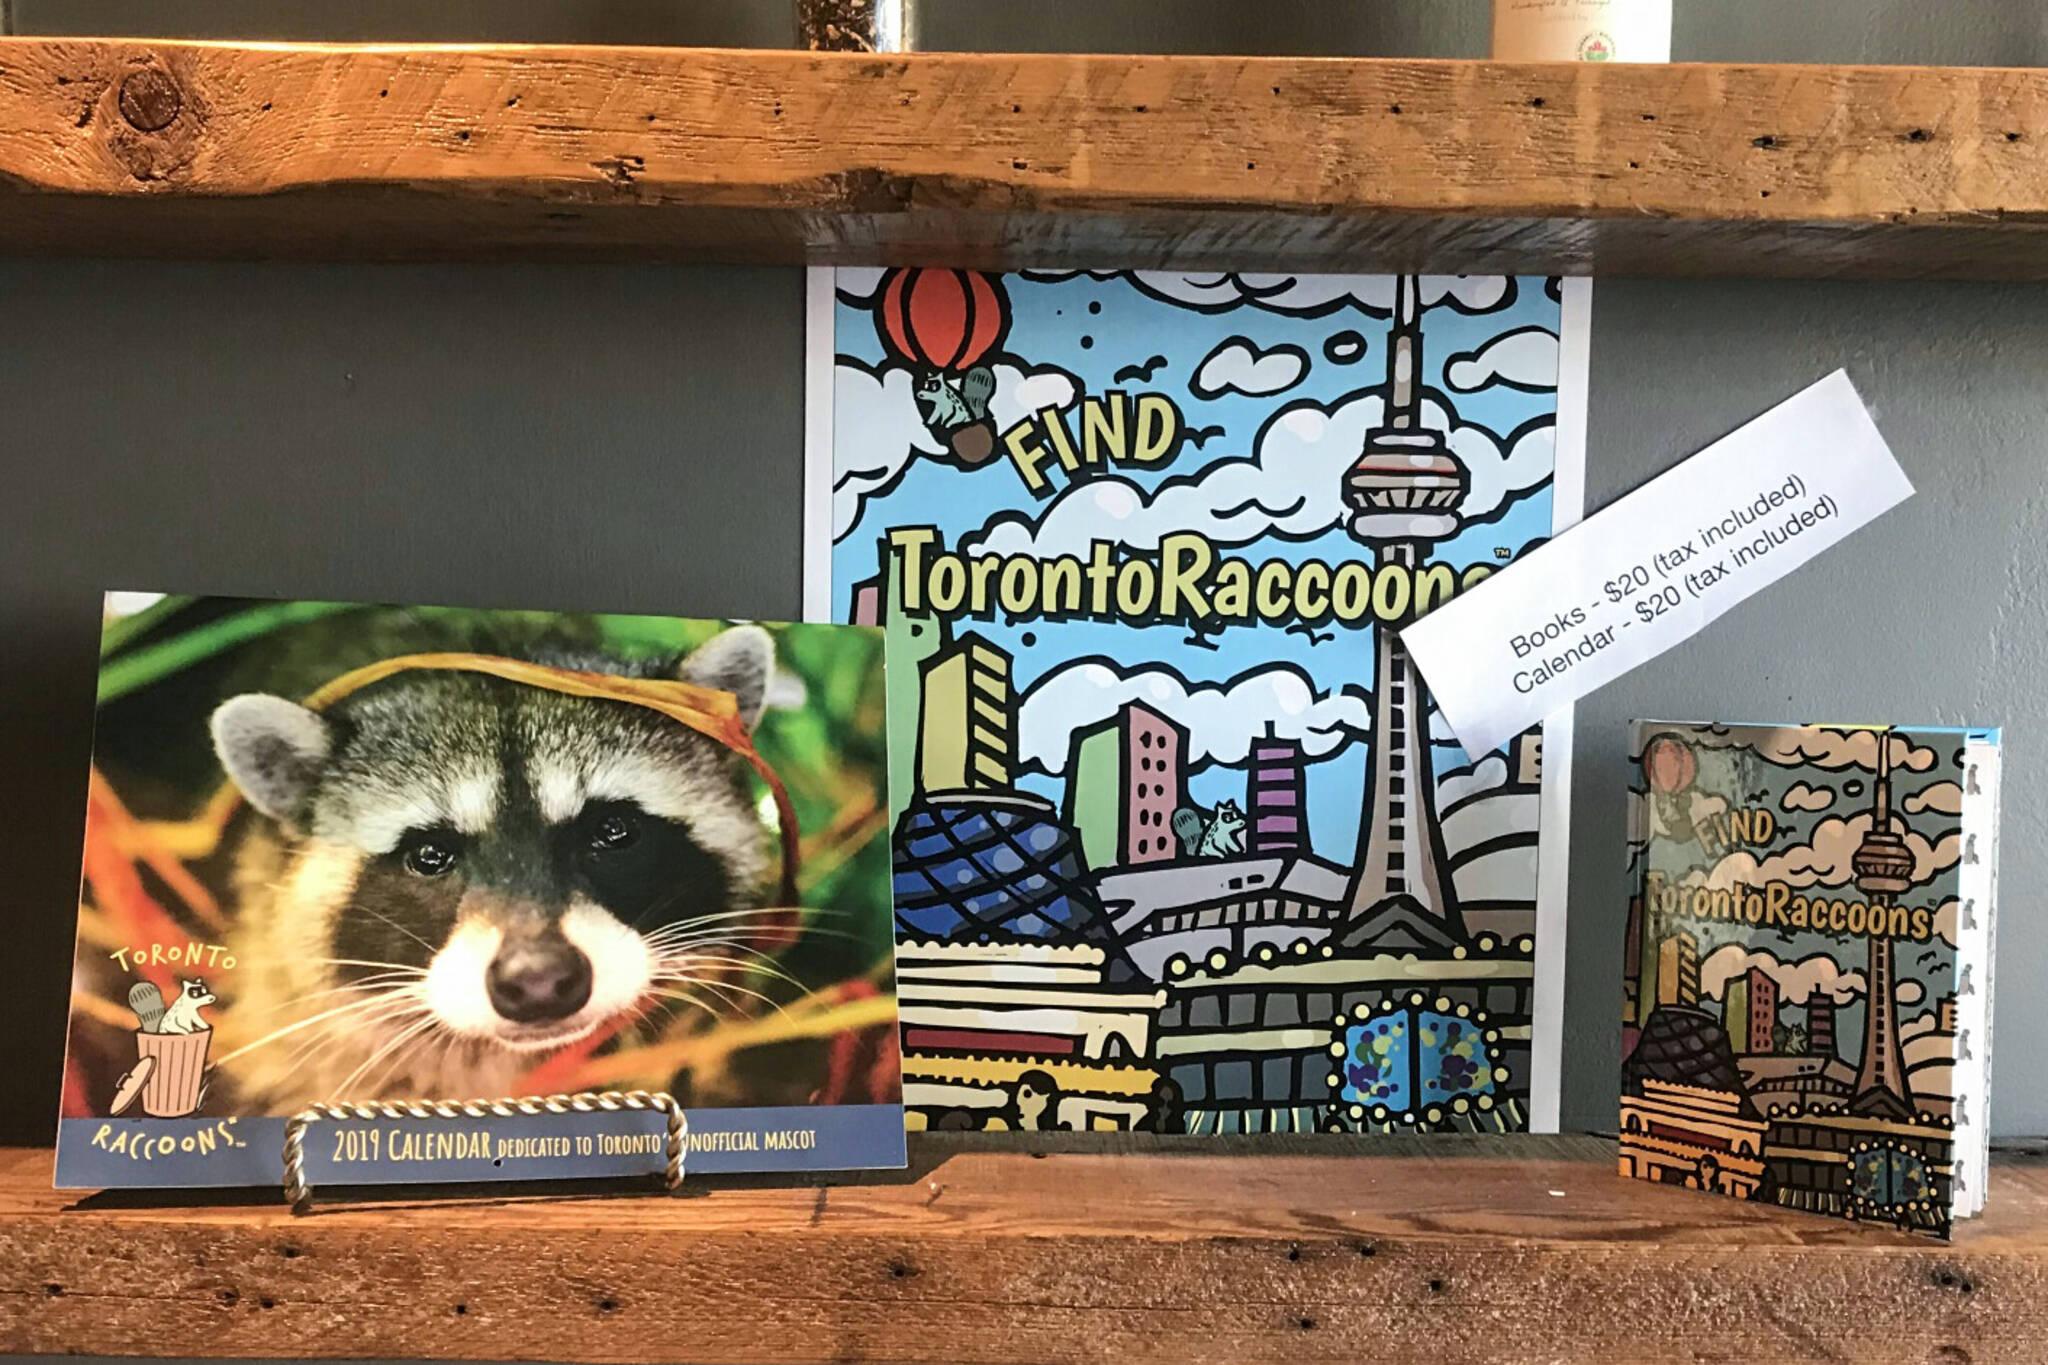 Toronto Raccoons book